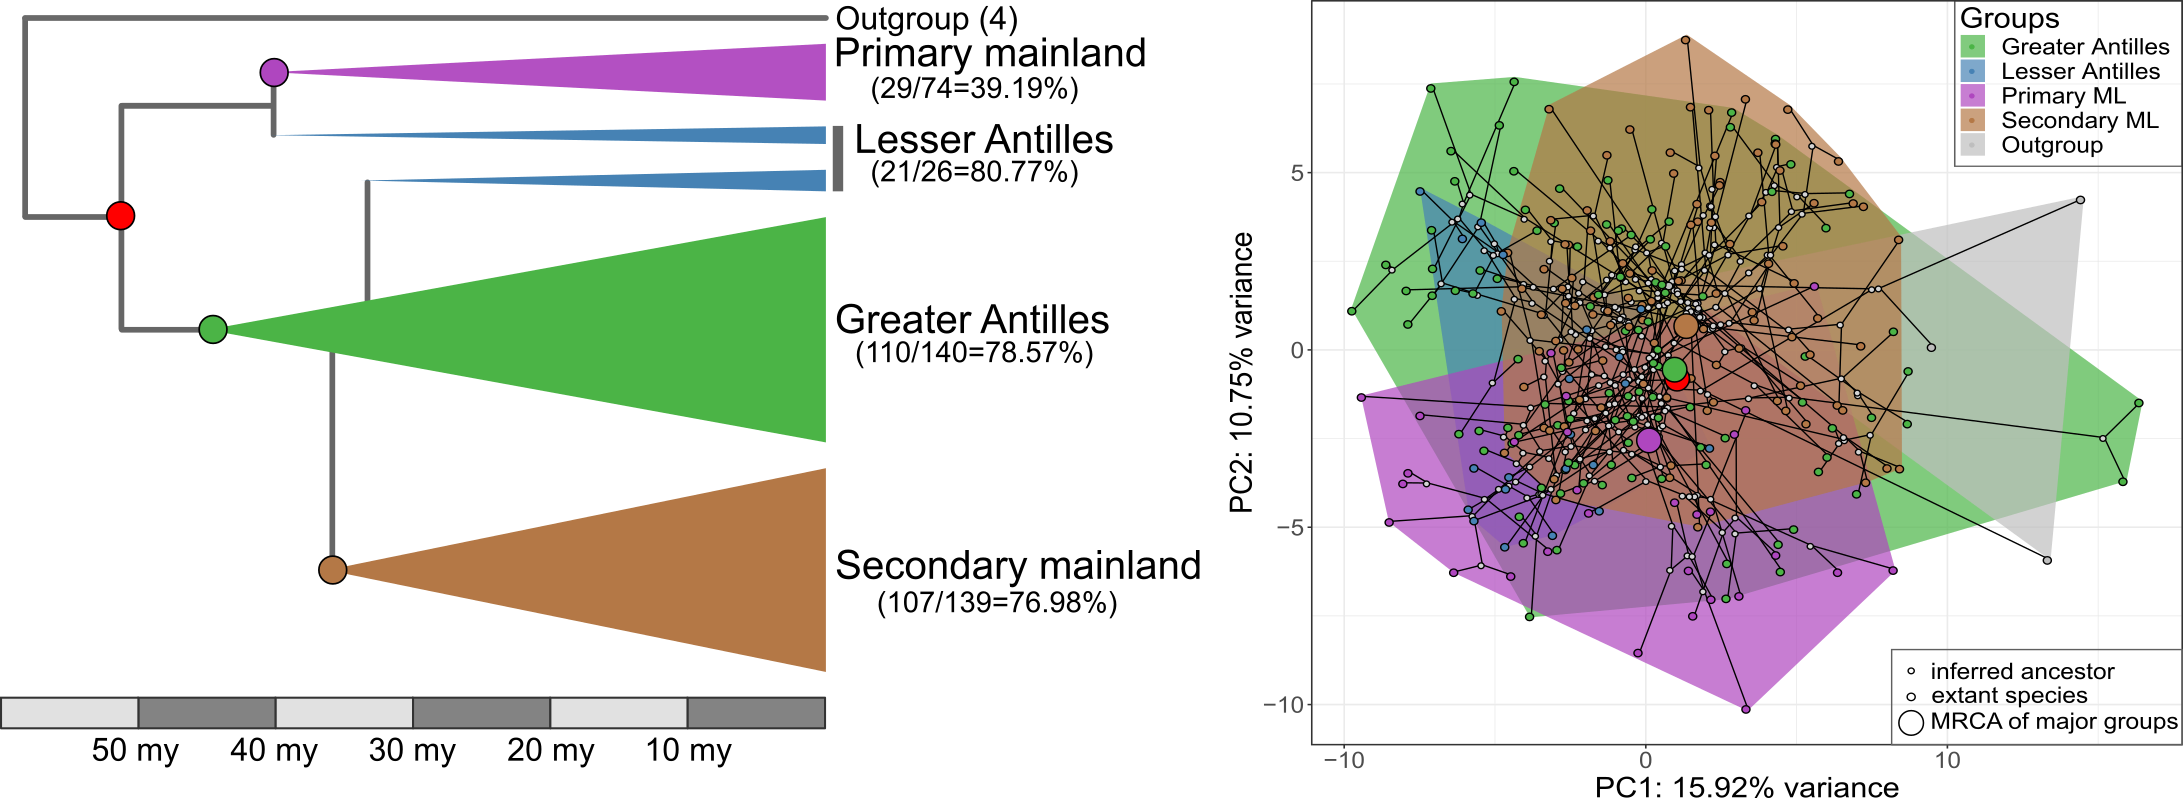 Anolis groups